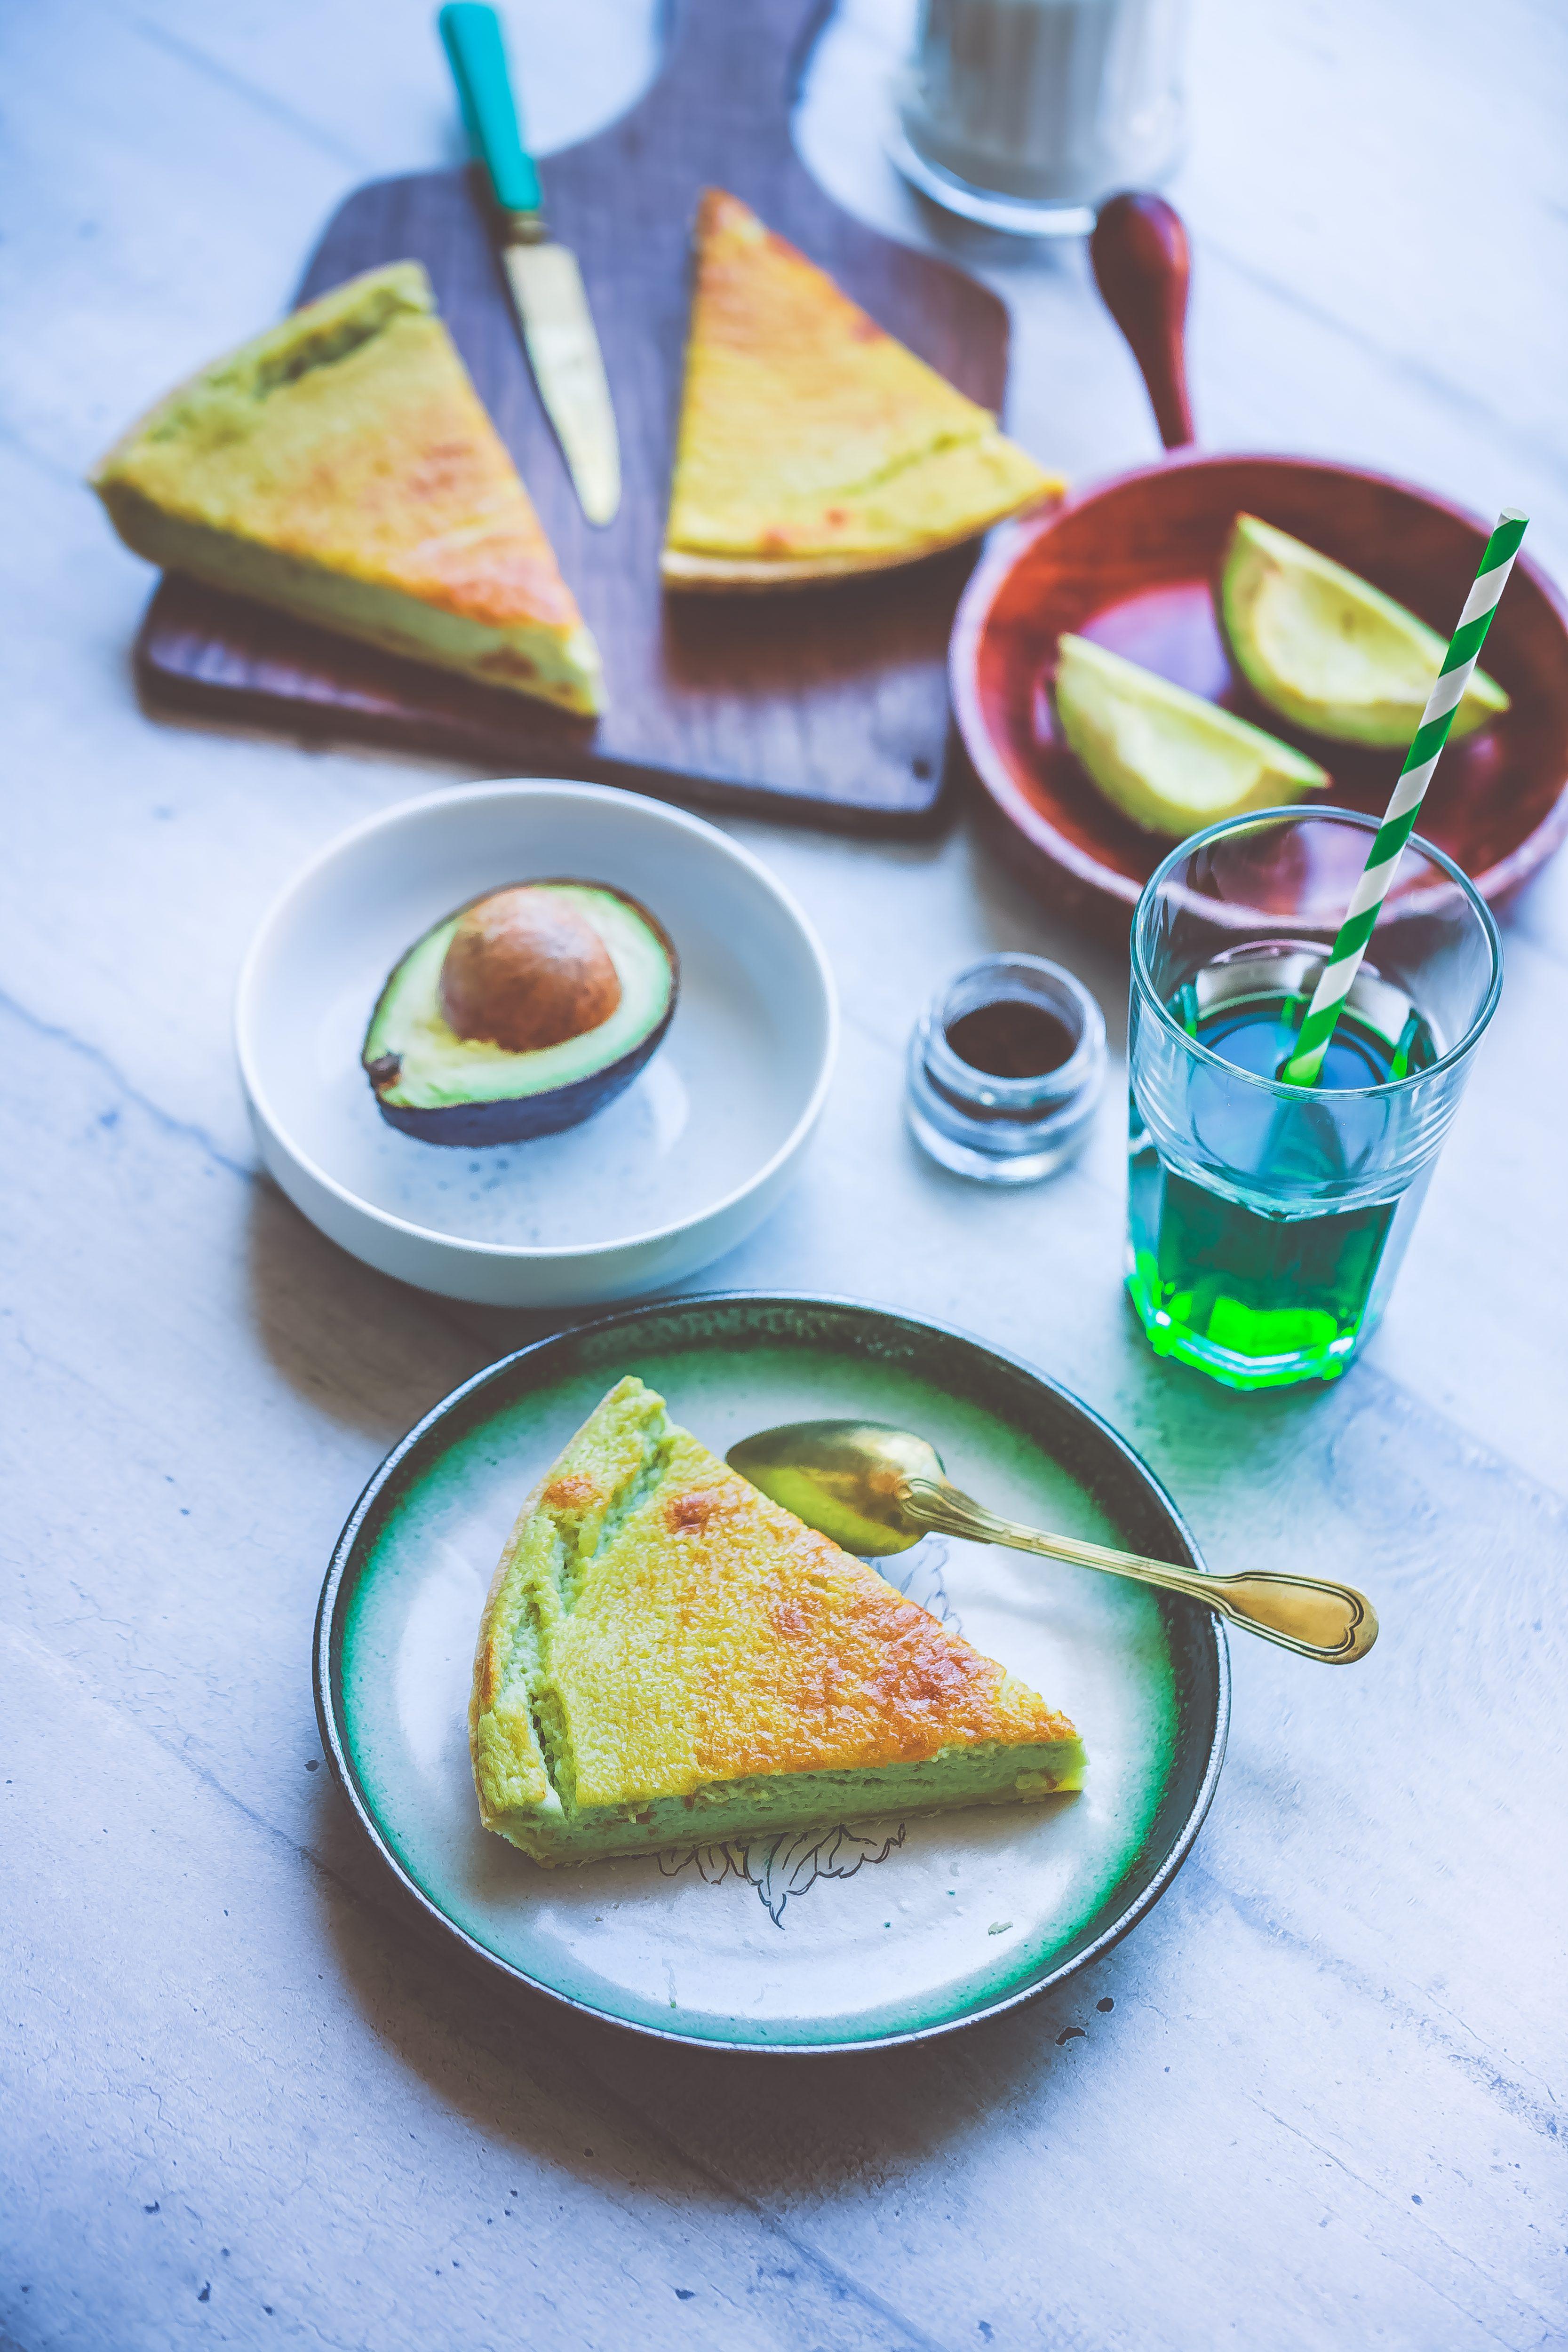 Recette facile Tarte sucrée Avocat Vanille